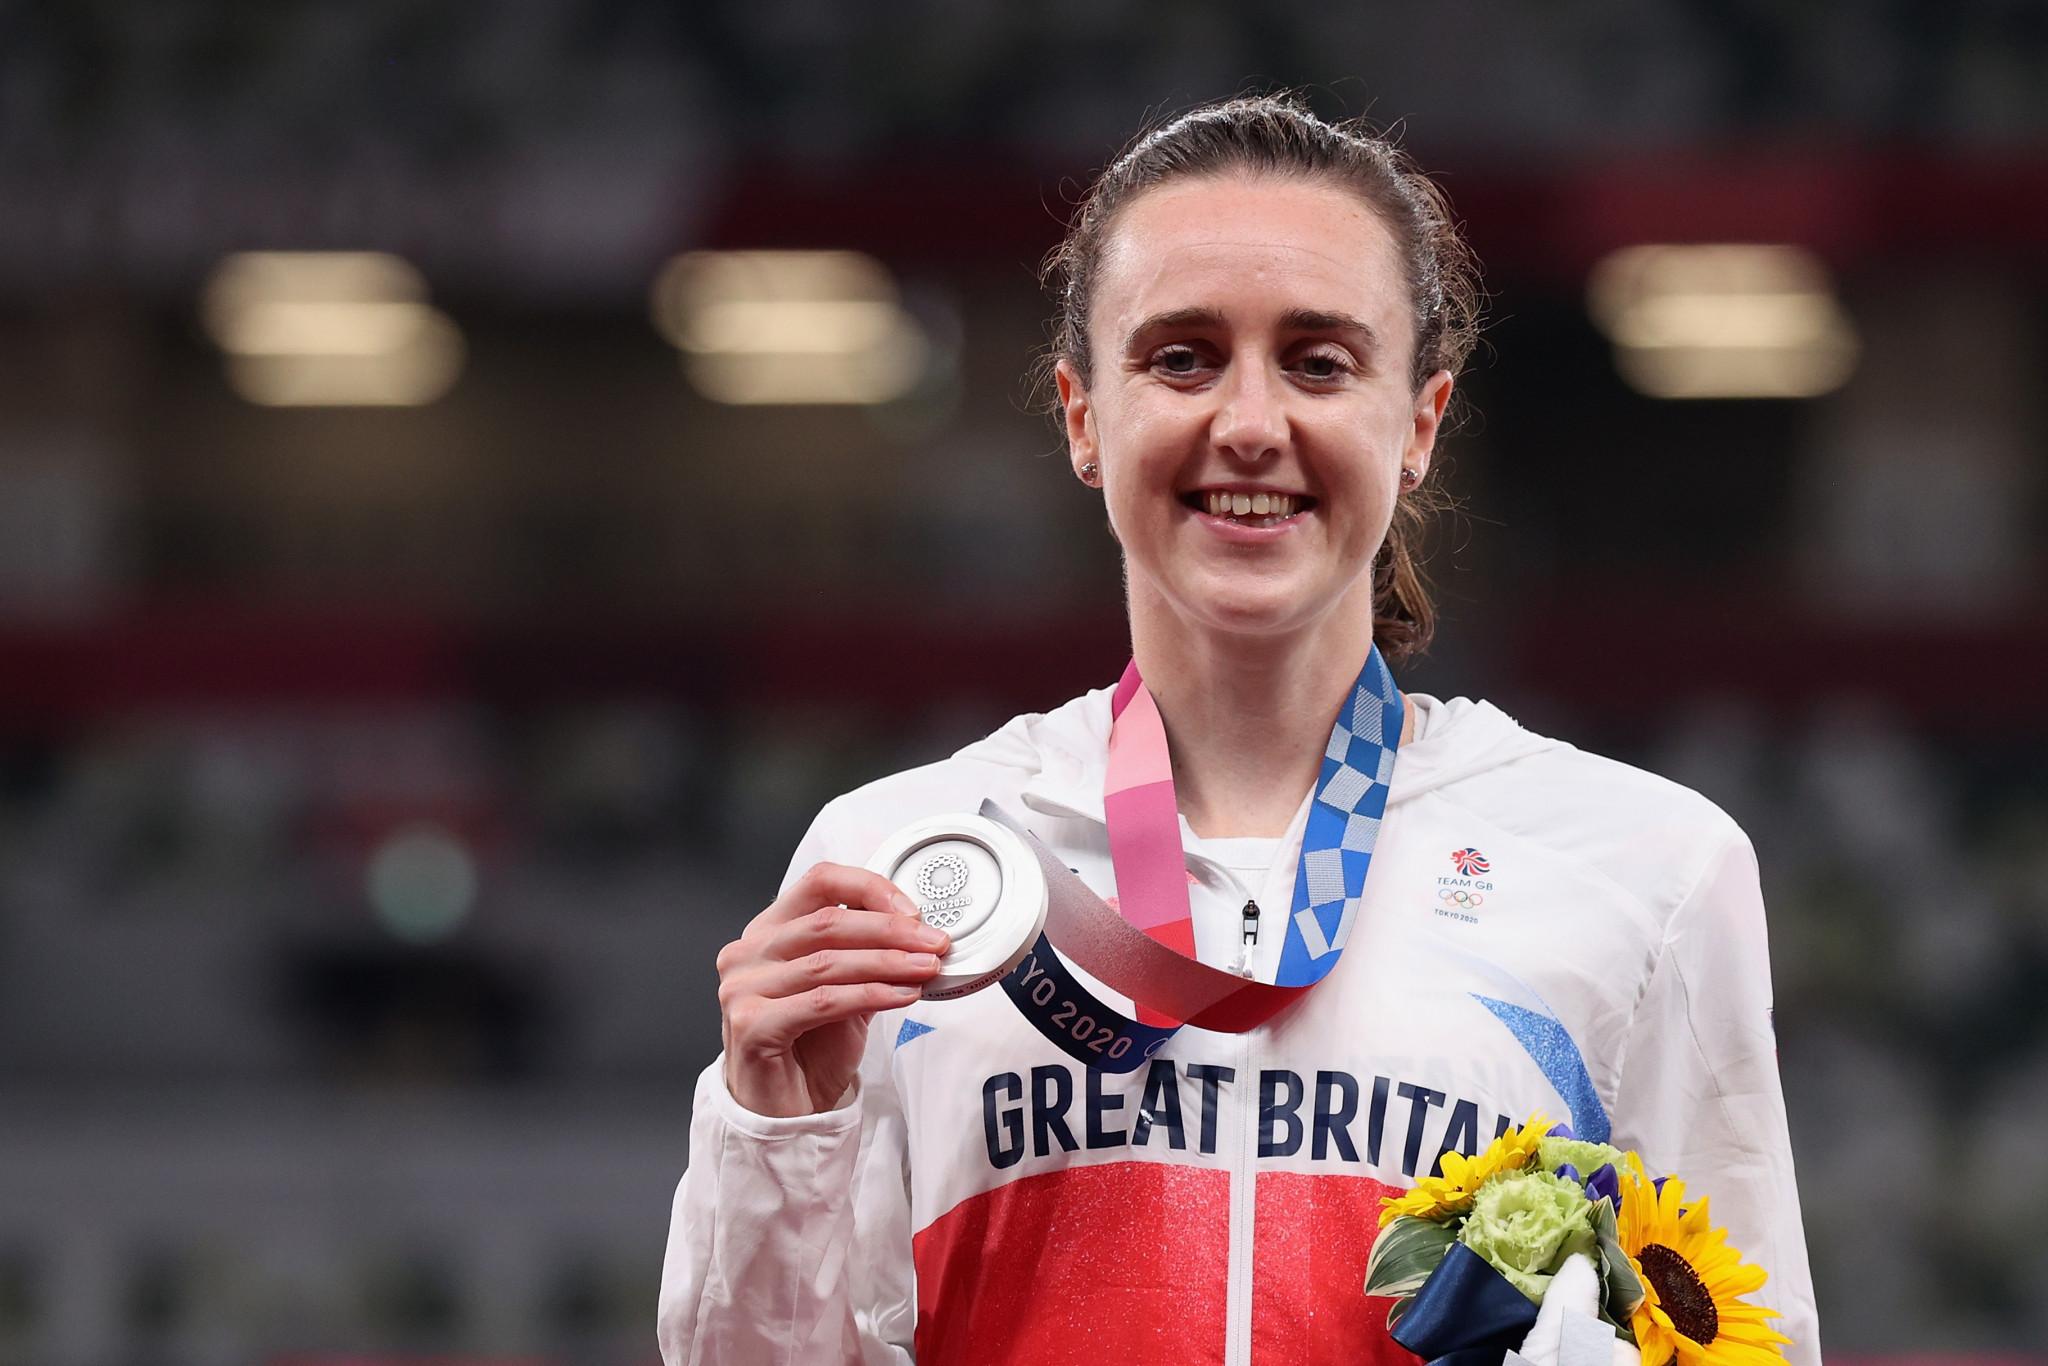 Tokyo silver medallist Muir among first Scottish athletes named for Birmingham 2022